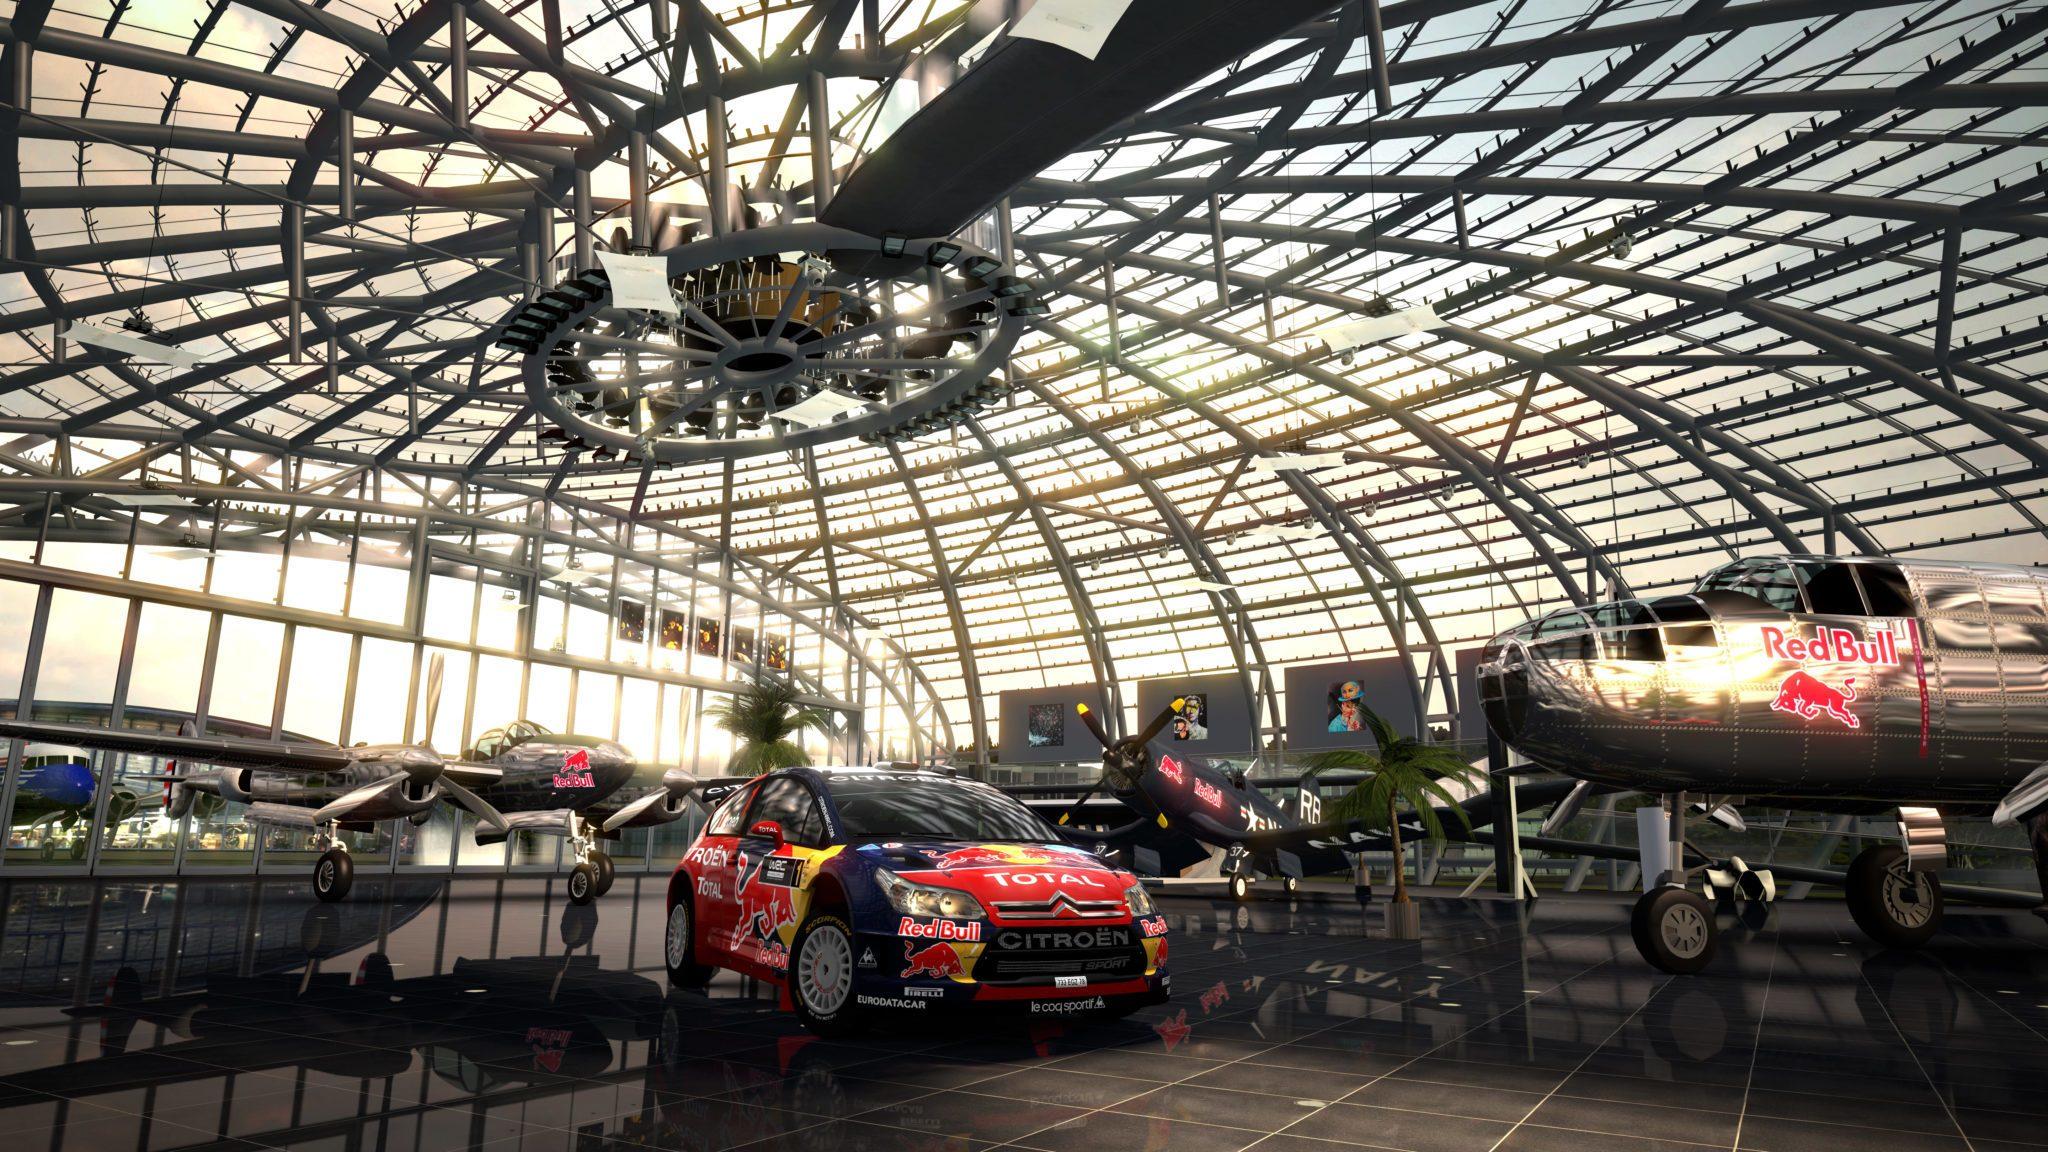 Gran_Turismo_5_Photo_Mode_Red_Bull_Hangar_7_Citroen_C4_WRC_08 Remarkable Lotus Carlton Gran Turismo 5 Cars Trend